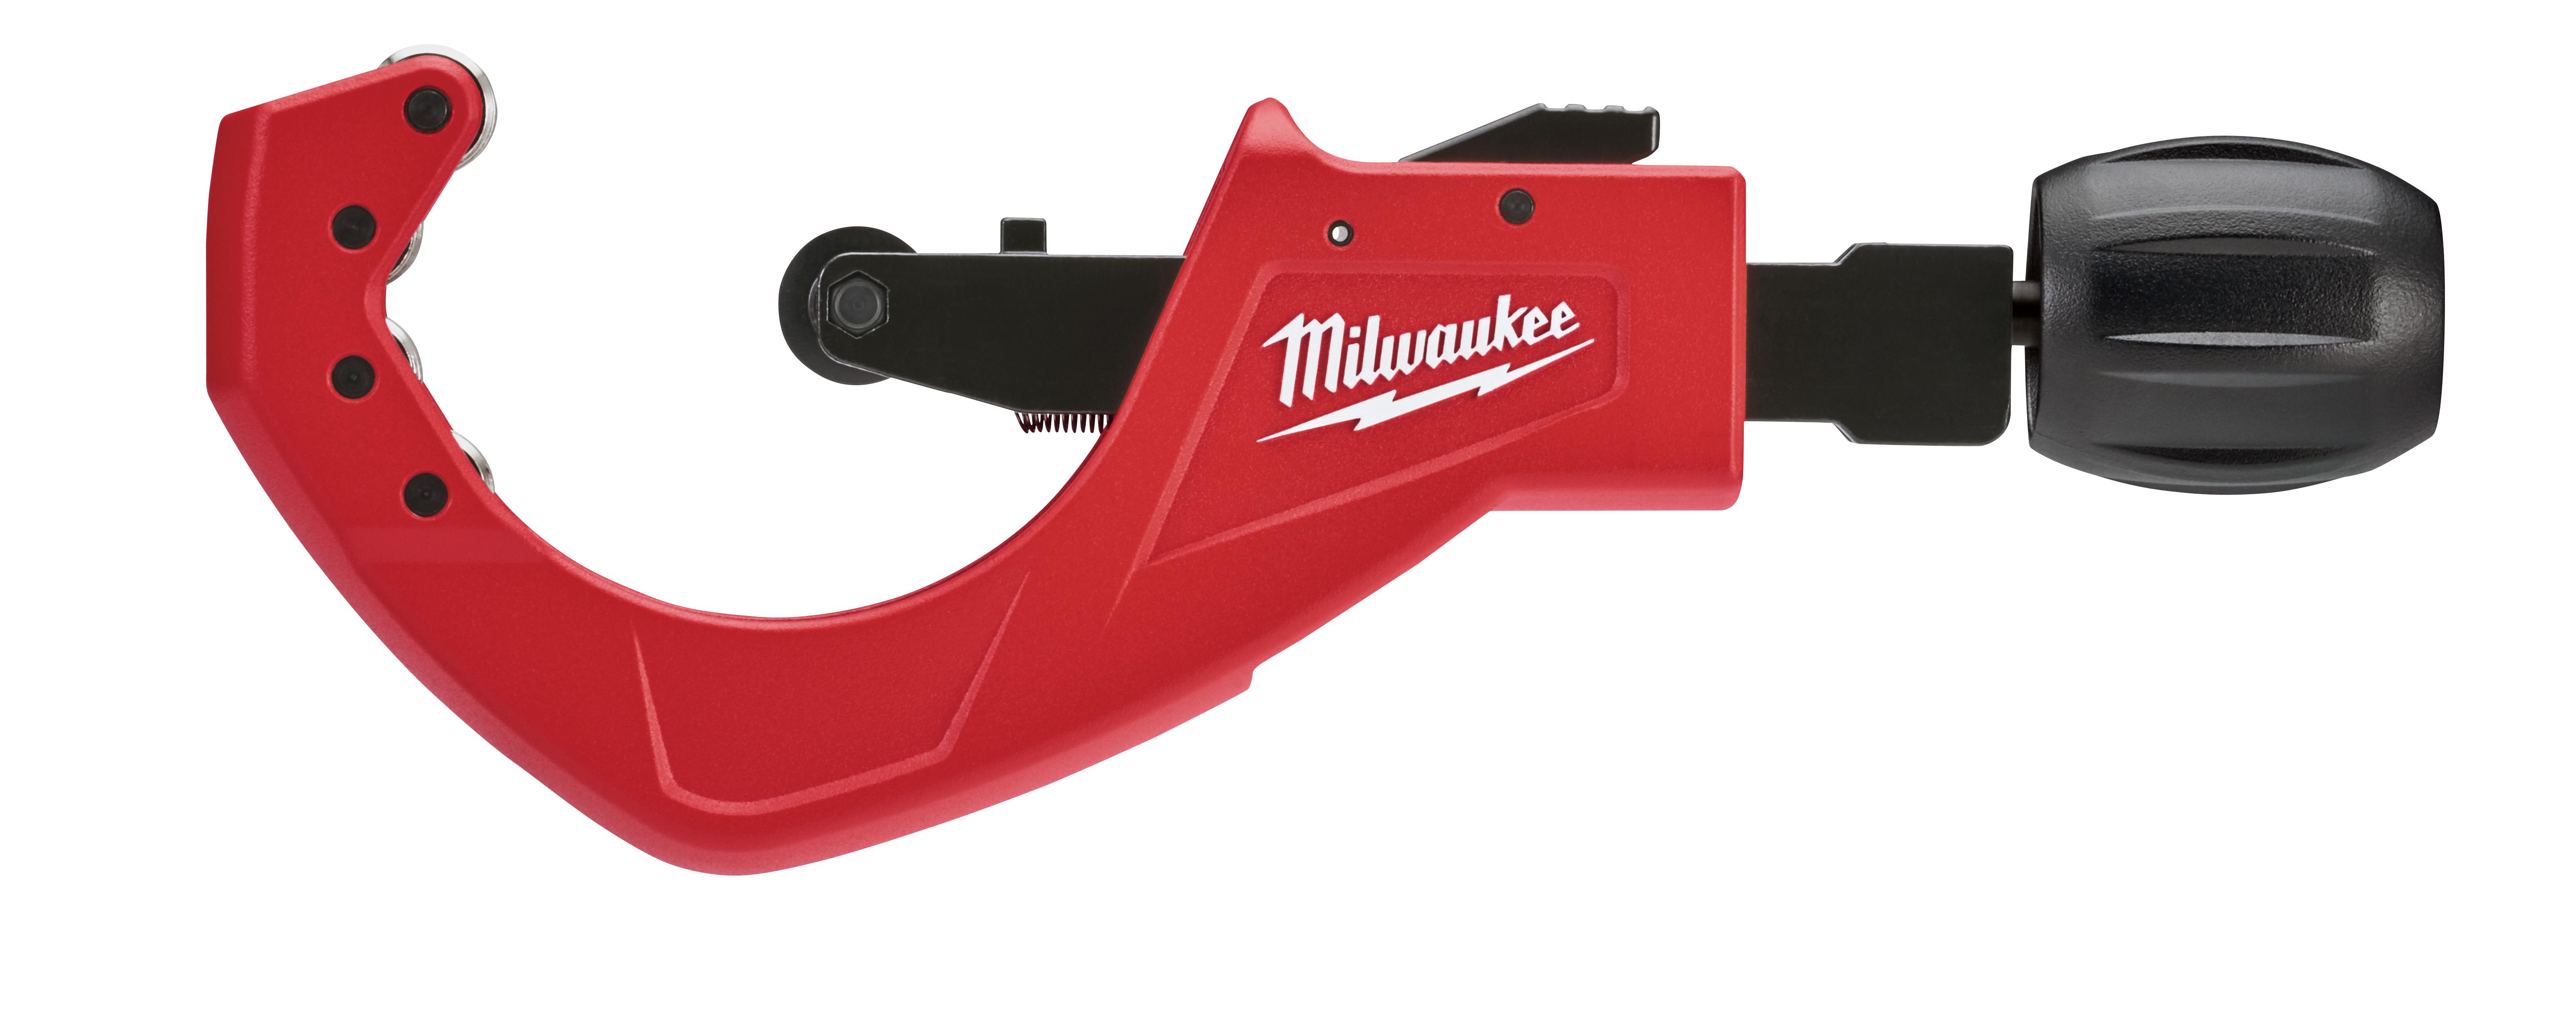 Milwaukee® 48-22-4253 Quick Adjust Tubing Cutter, 1/4 to 2-5/8 in, Steel Cutting Edge